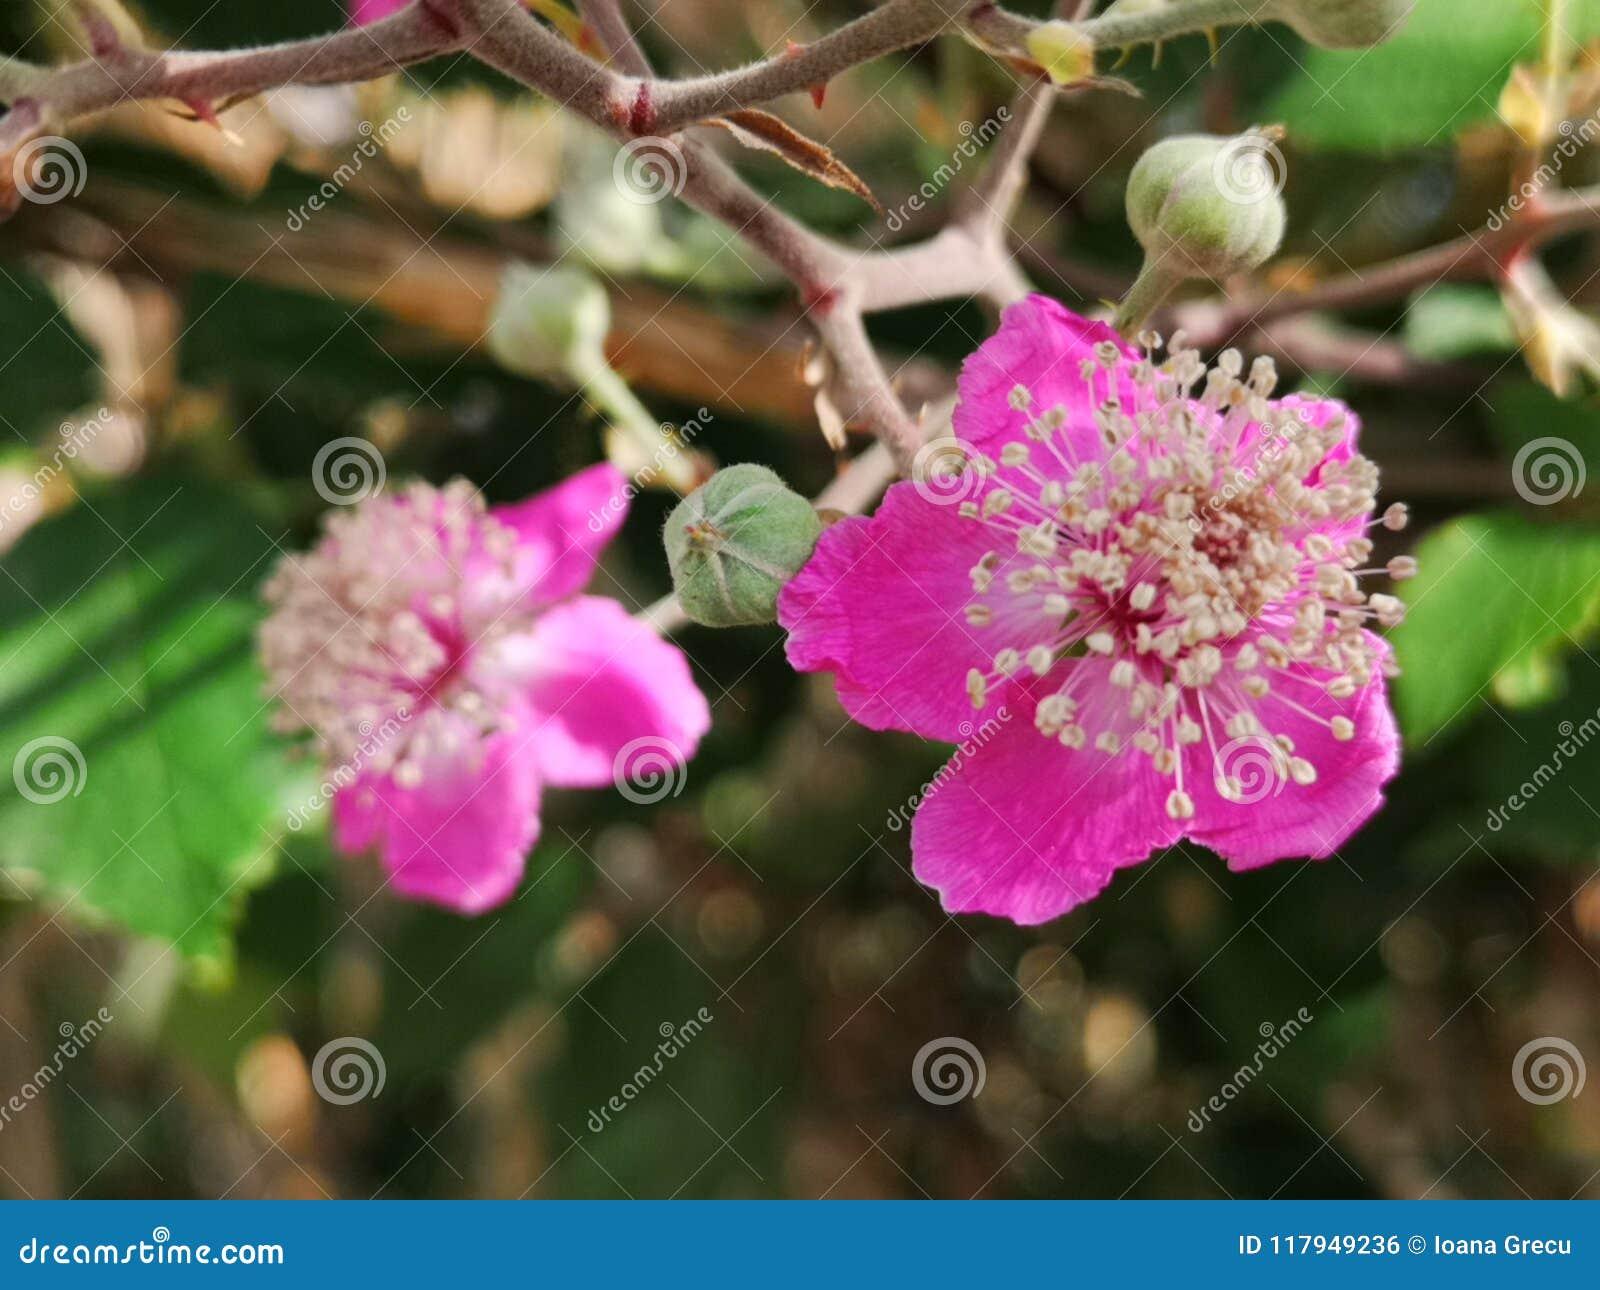 Blackberry flower, Morus Nigra